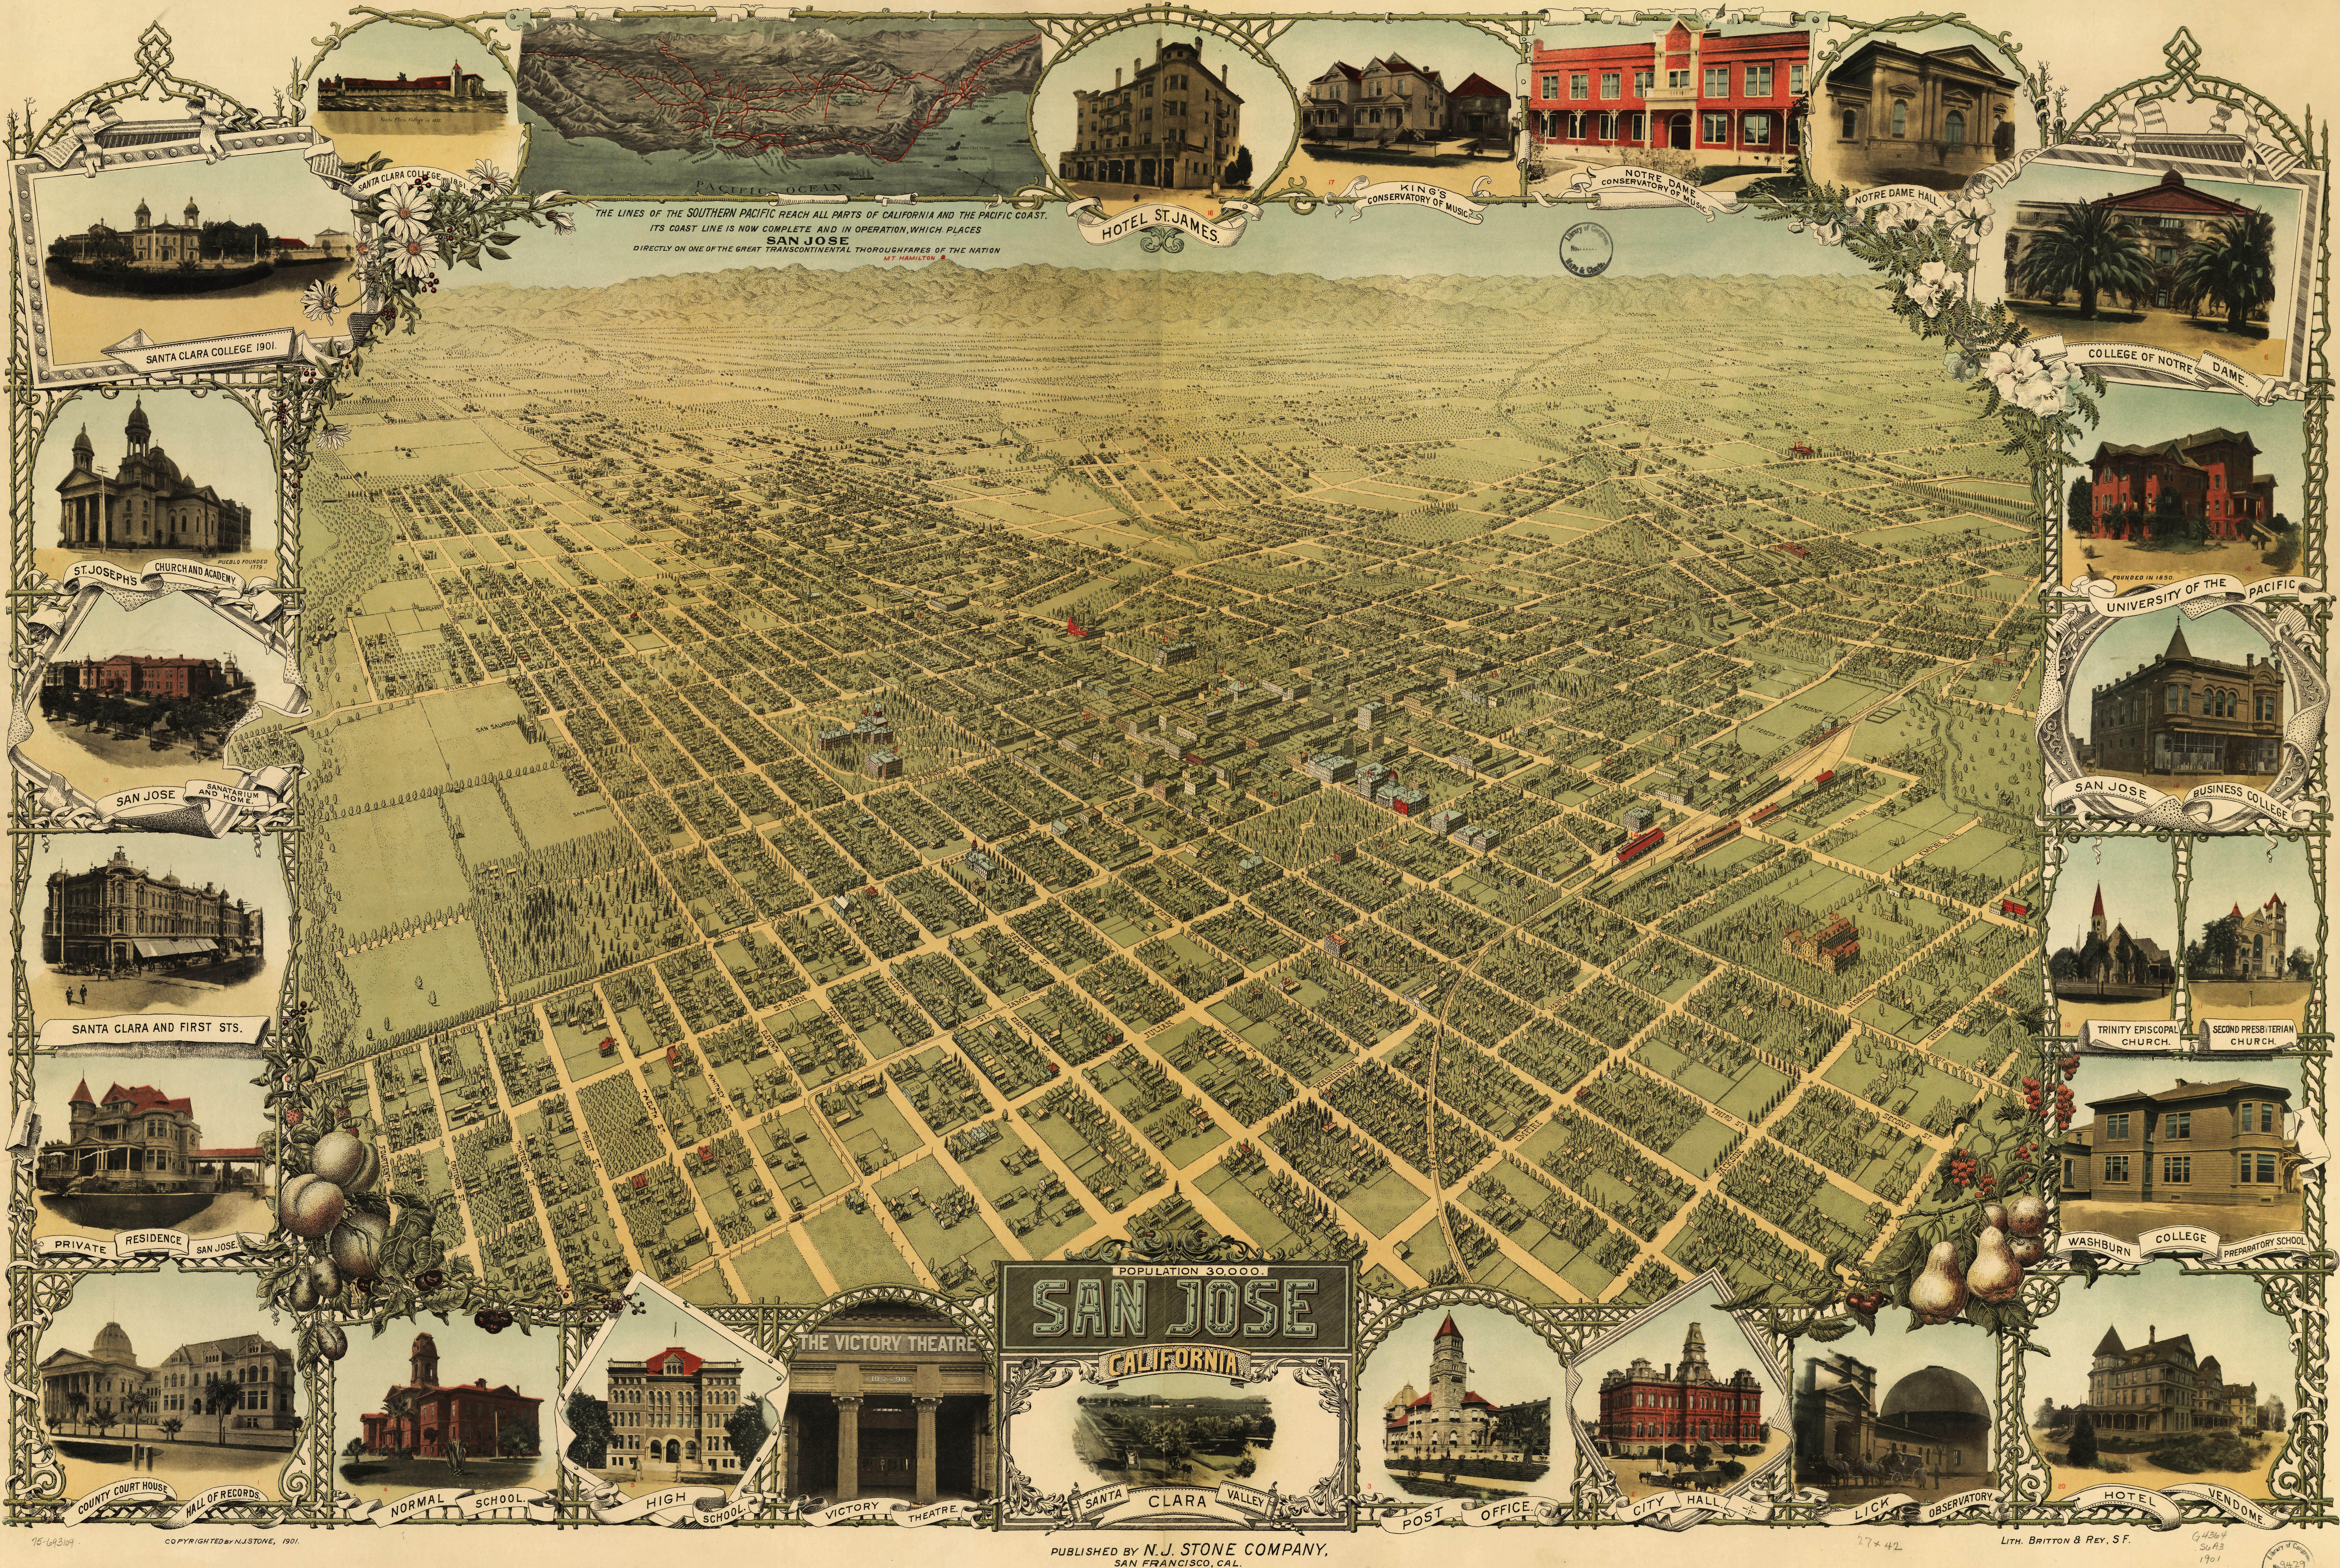 Stone\'s Birdseye Map of San Jose, California (1901)